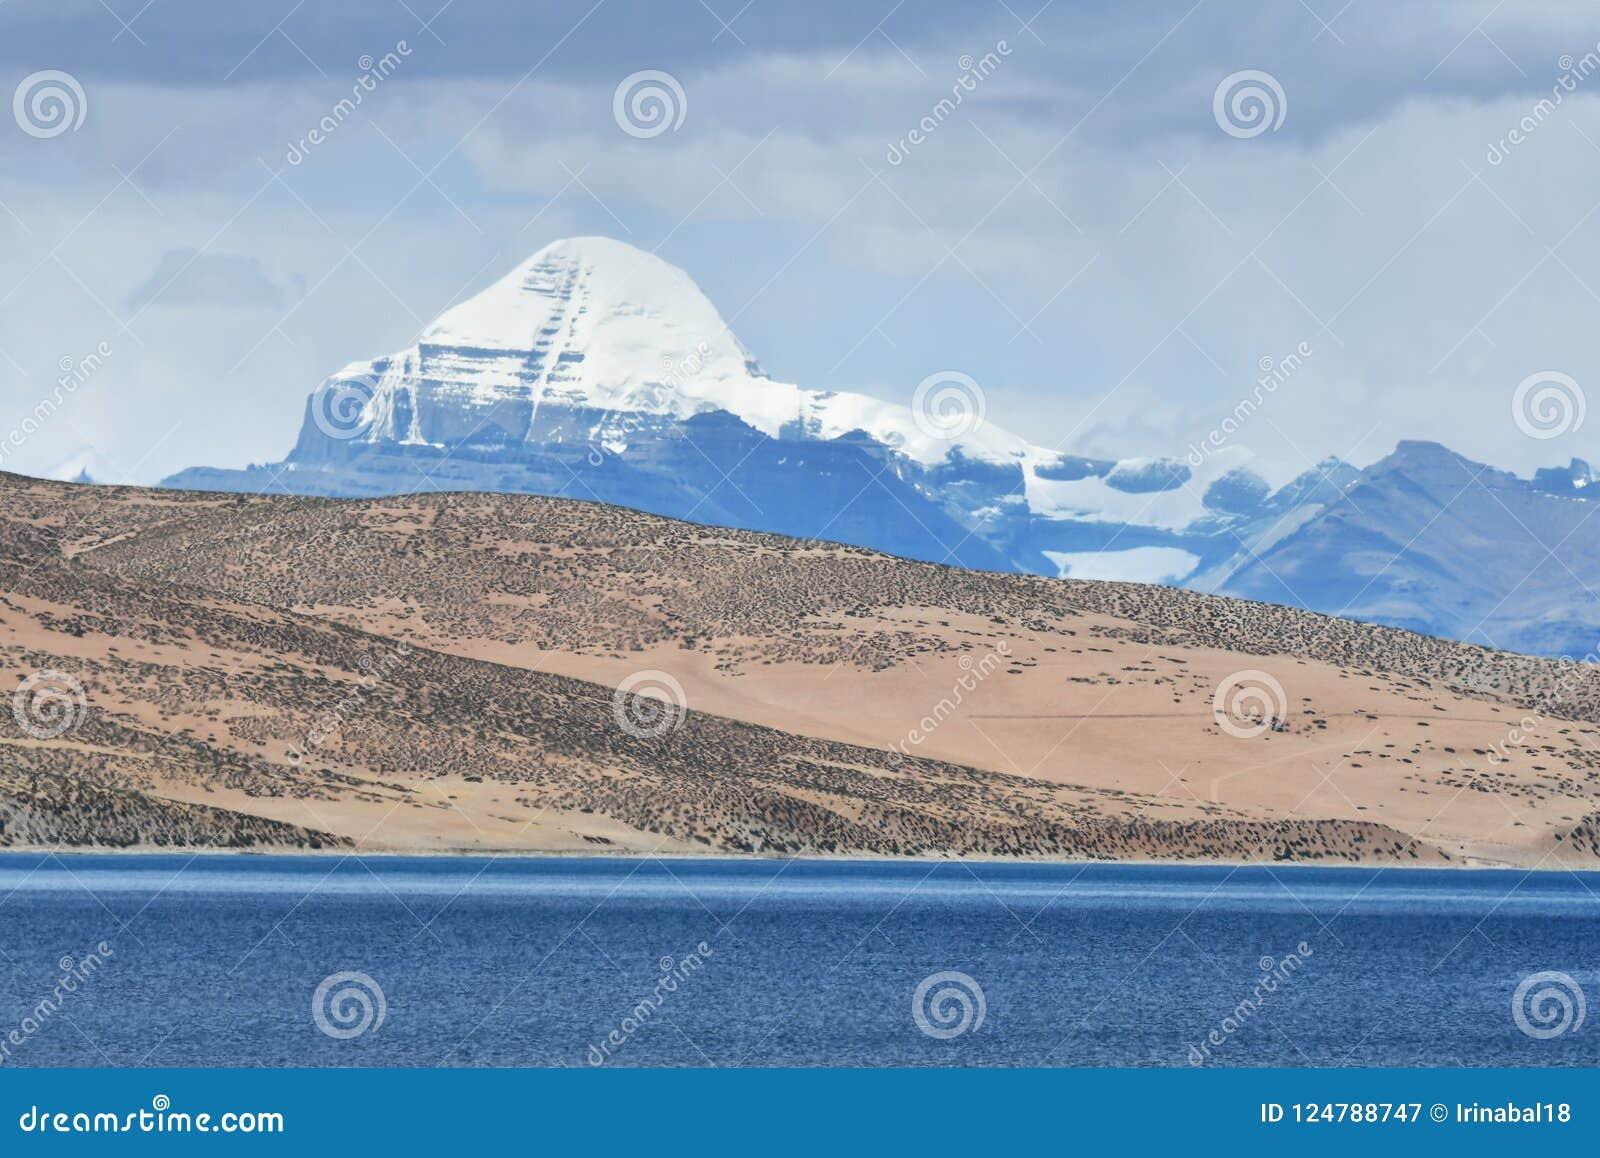 Tibet. Sacred lake Manasarovar and southern face of Kailas